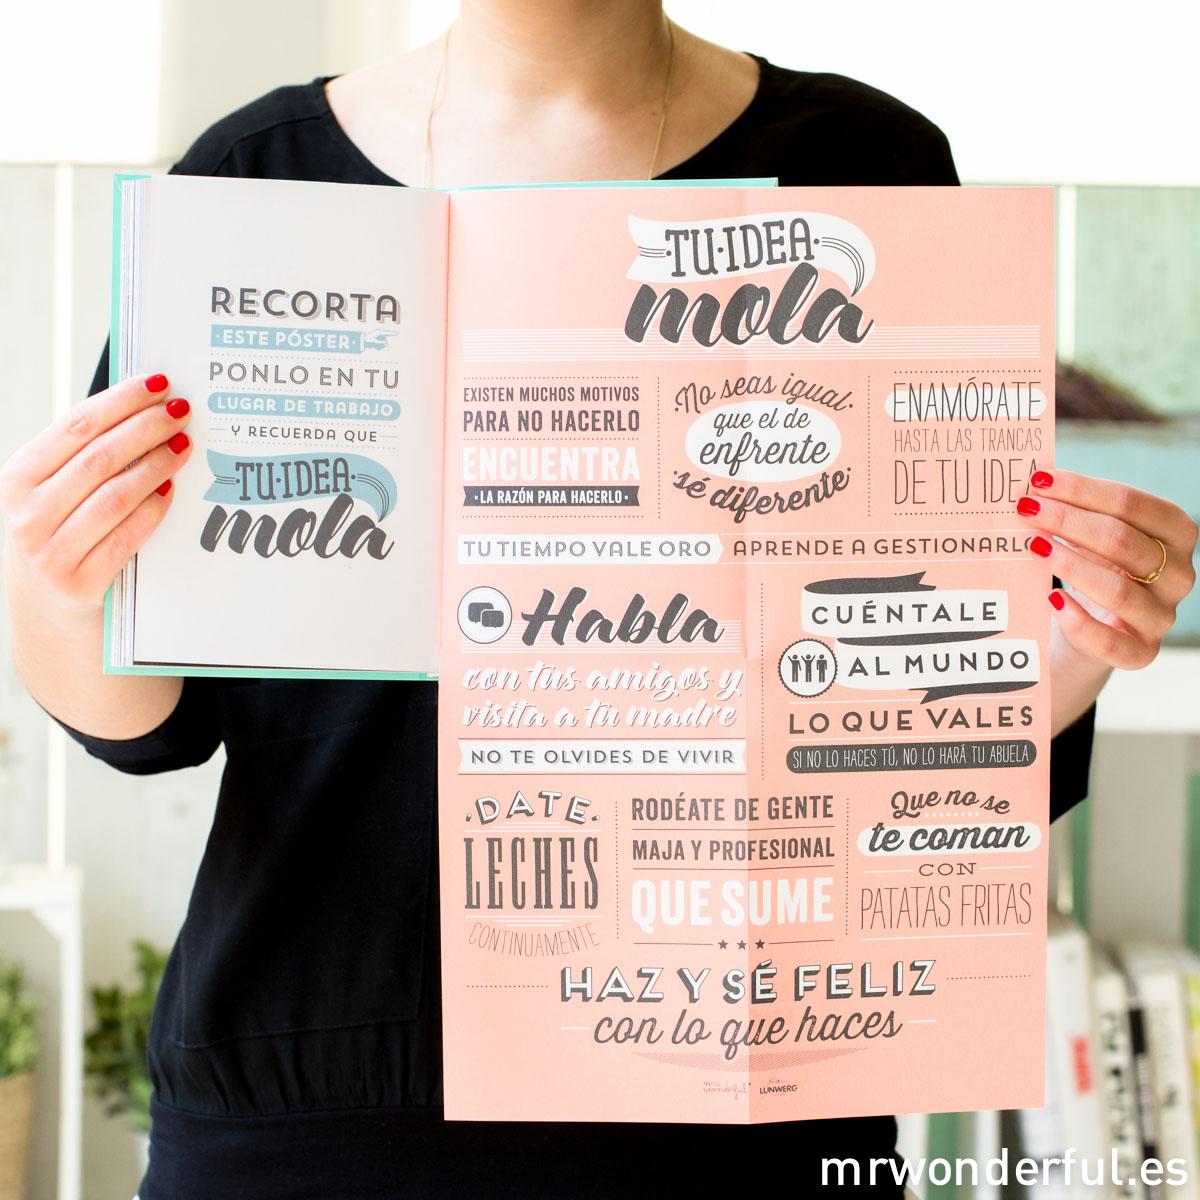 mrwonderful_libro-05_tu-idea-mola-21